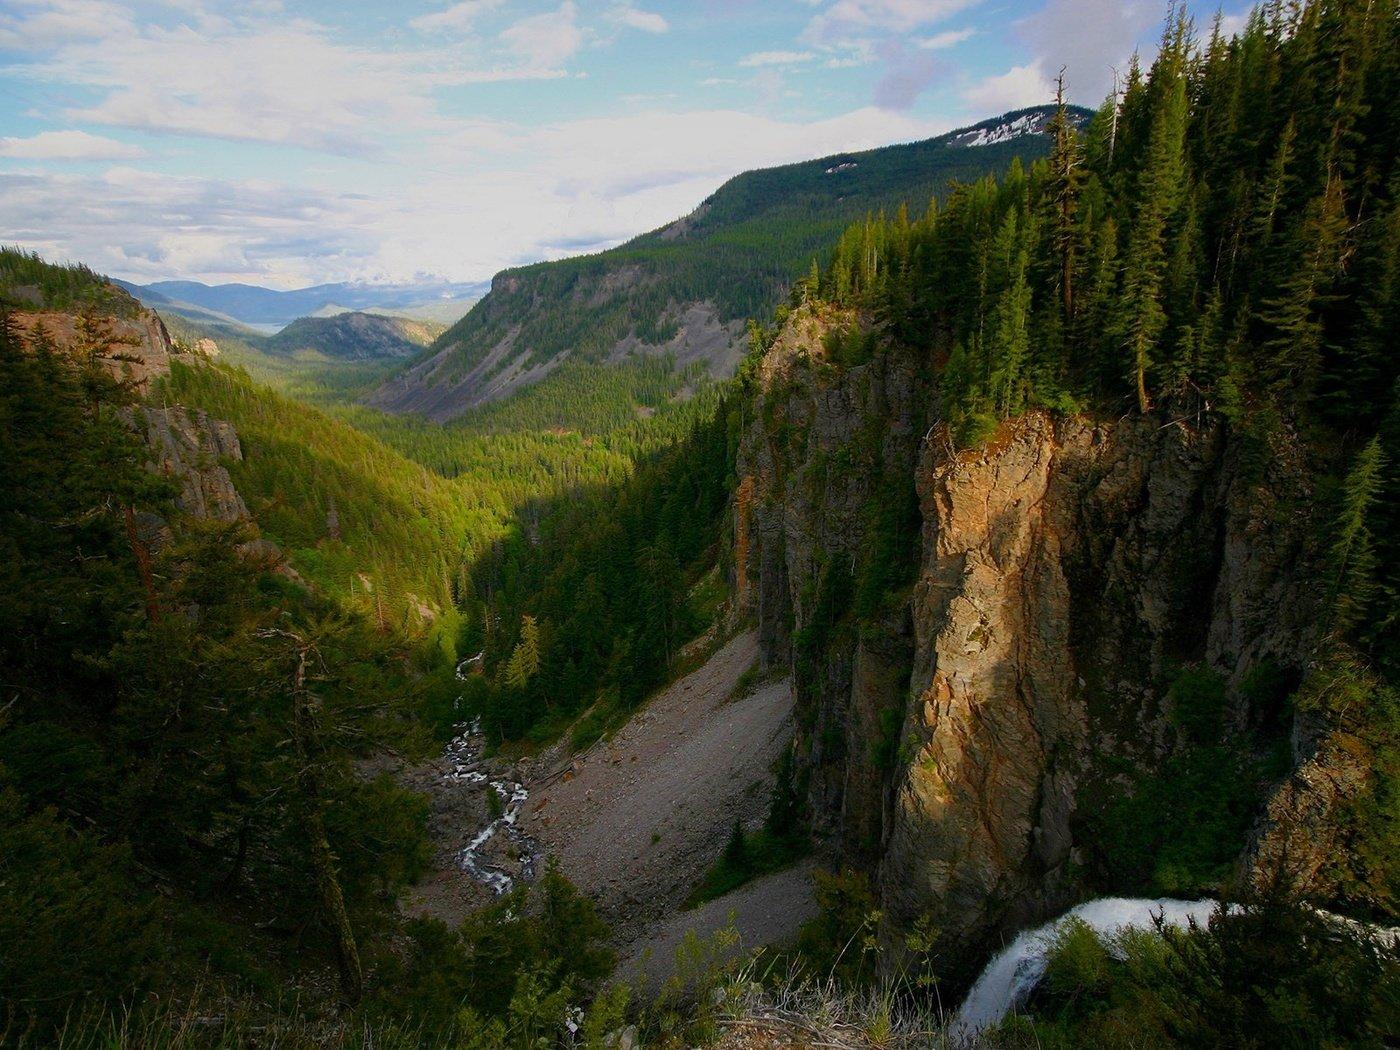 картинки тайга горная река сопки